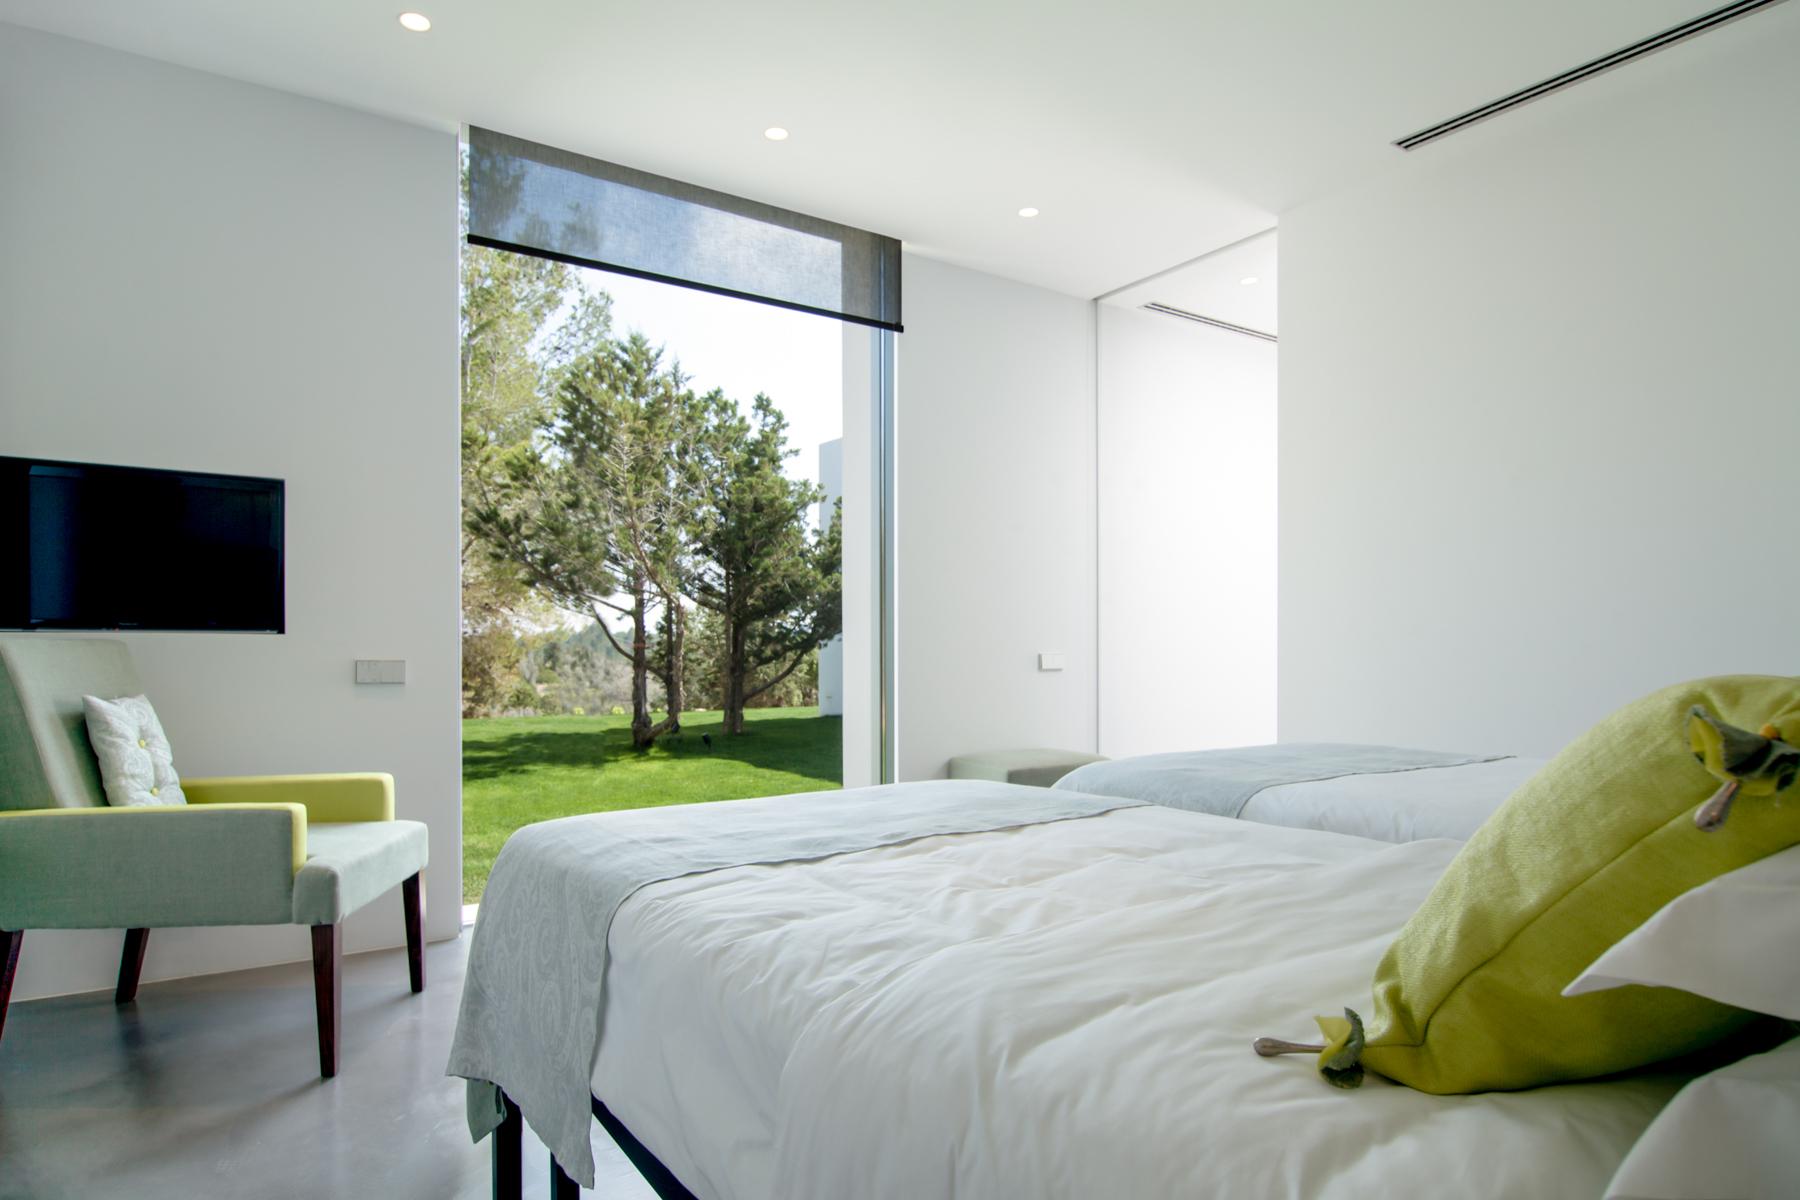 https://www.white-ibiza.com/wp-content/uploads/2020/05/white-ibiza-villas-can-zama-bedroom-one.jpg